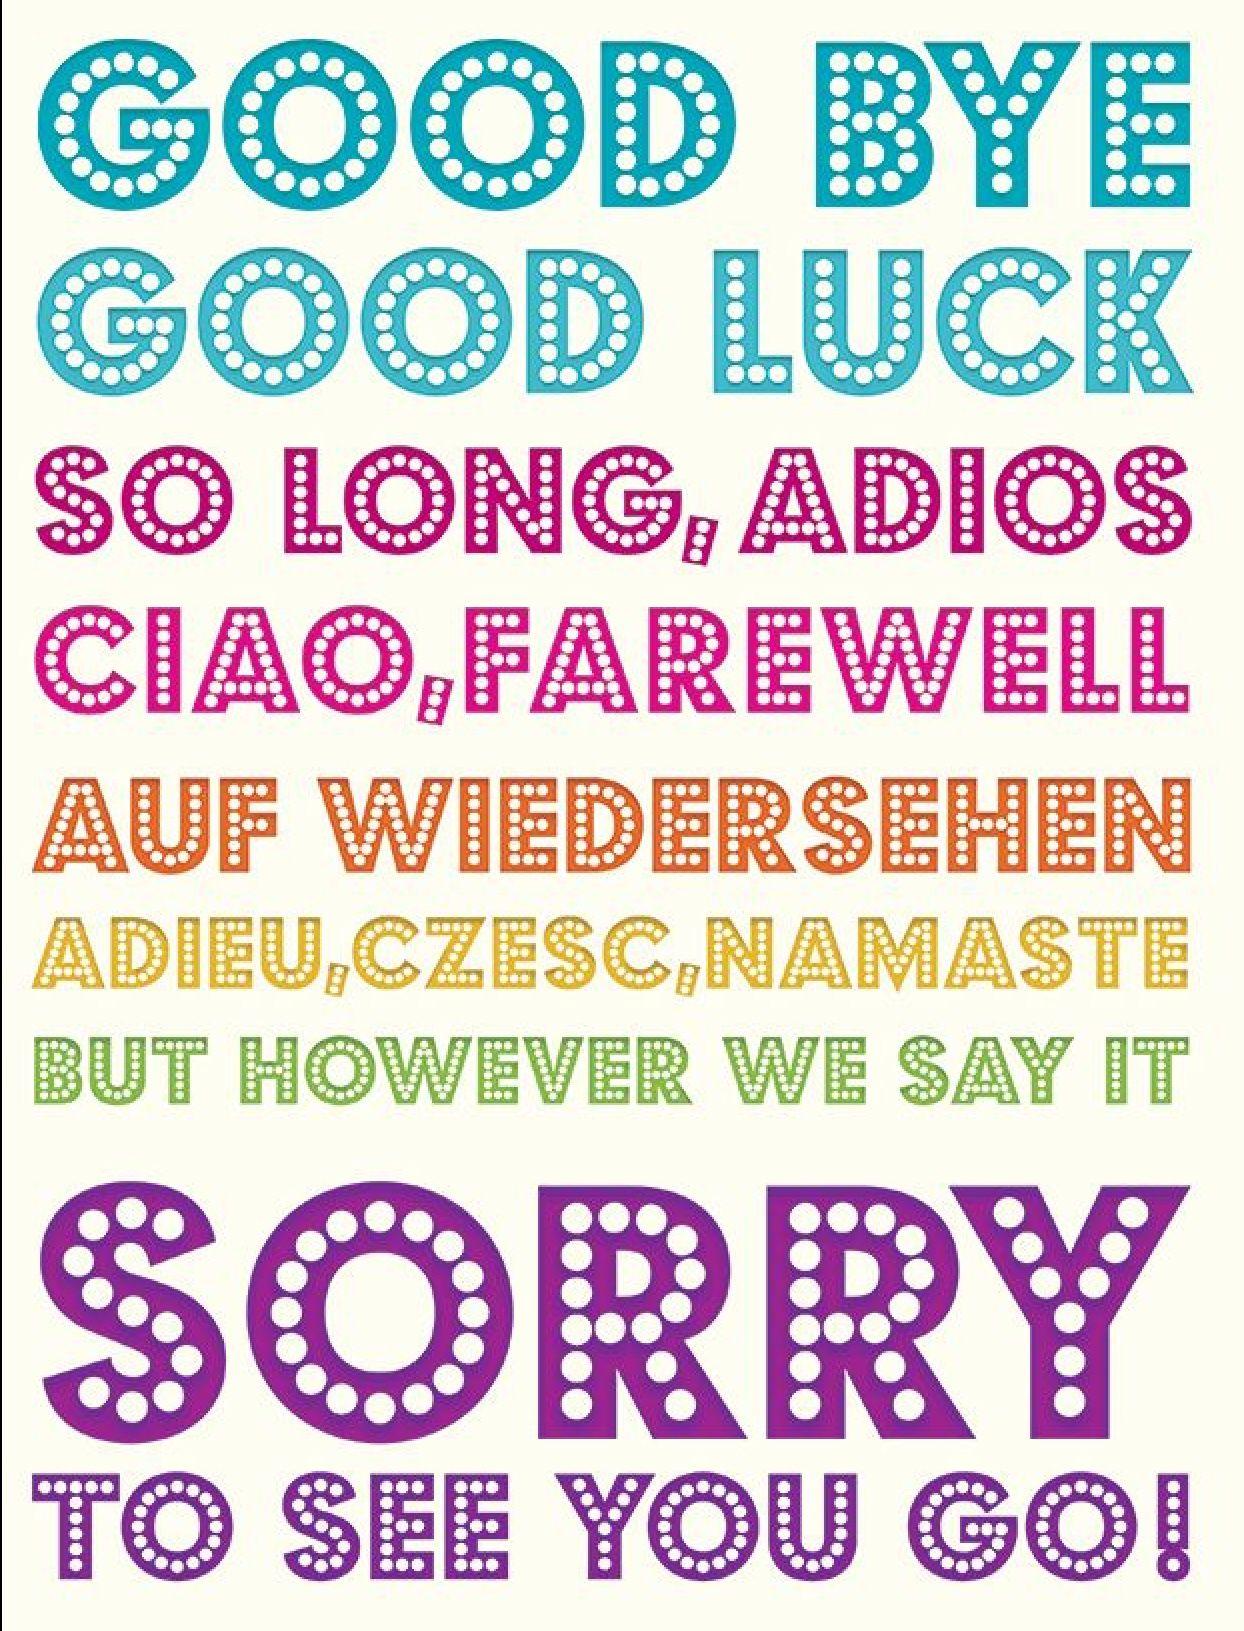 pinariel on boss  goodbye and good luck good luck